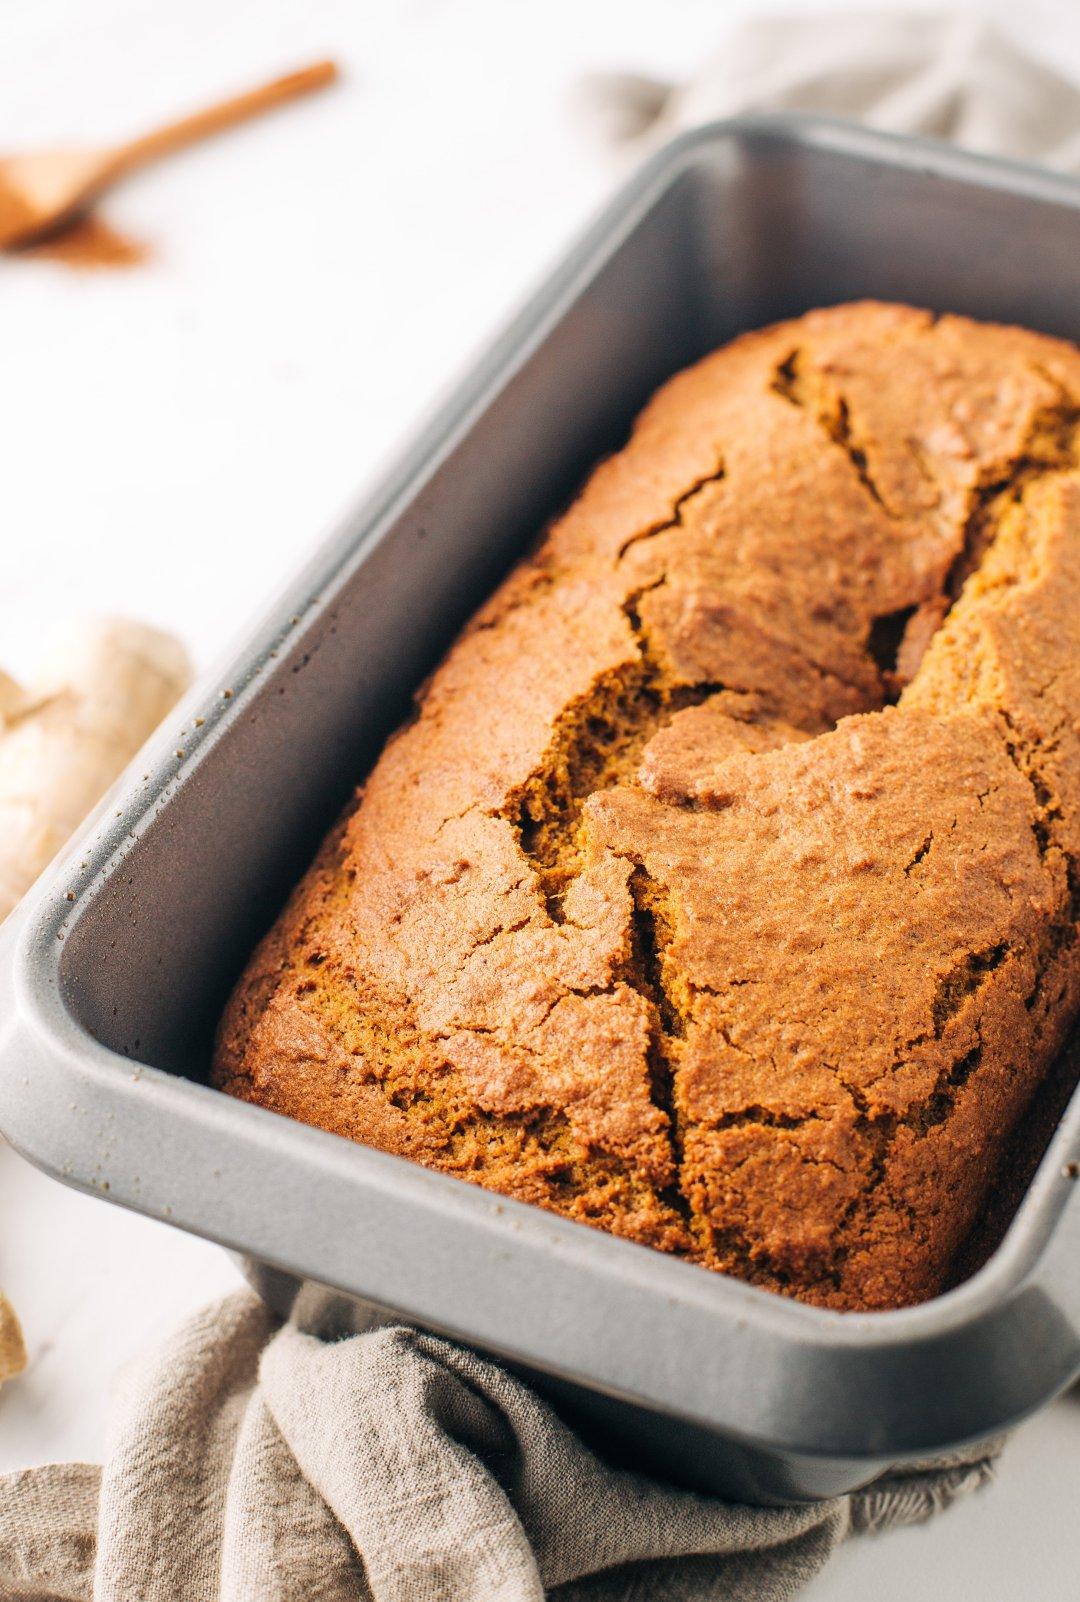 Fall baking recipe ideas